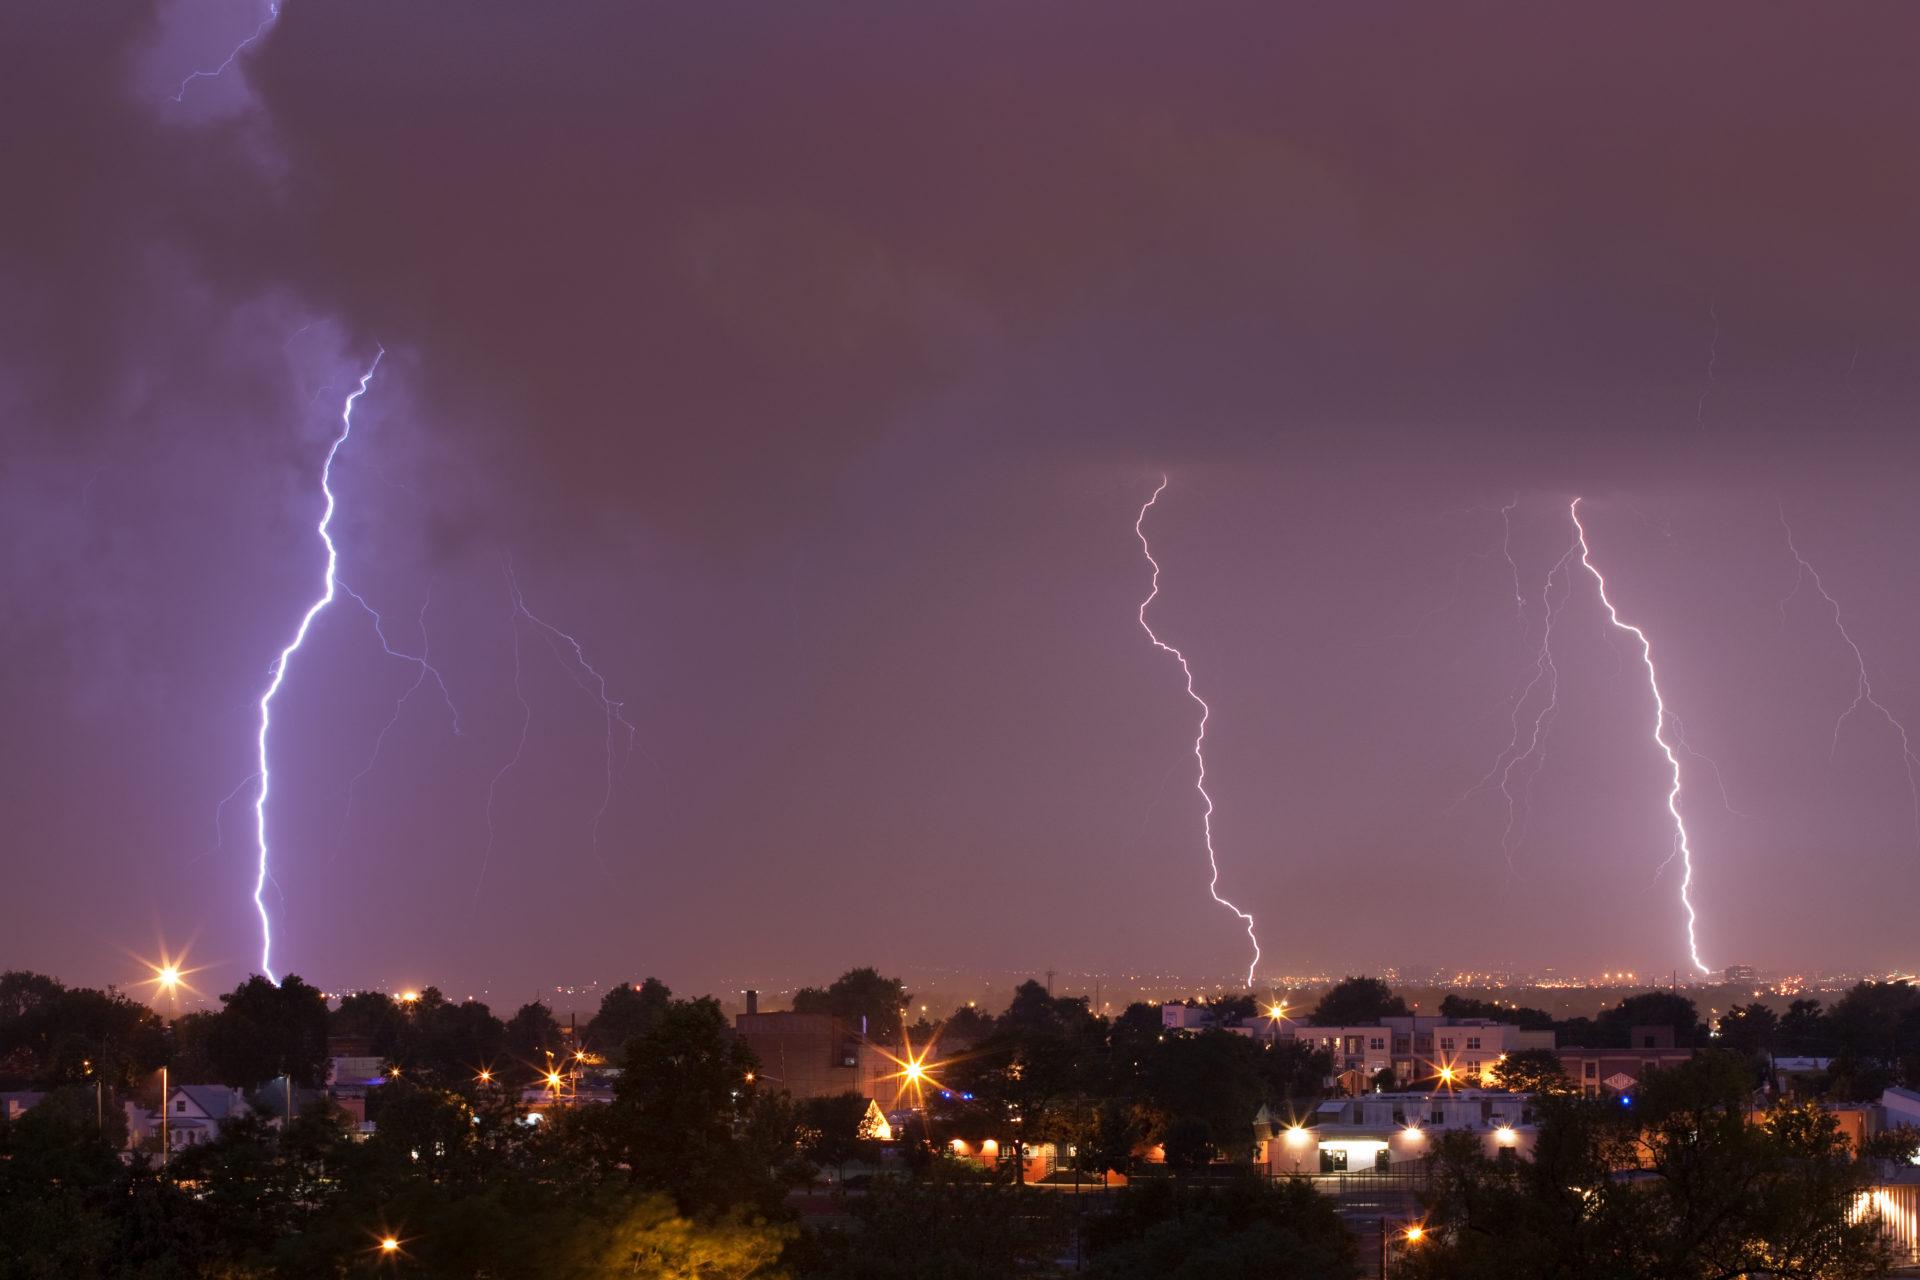 Mount Evans obscured with lightning - July 12, 2011